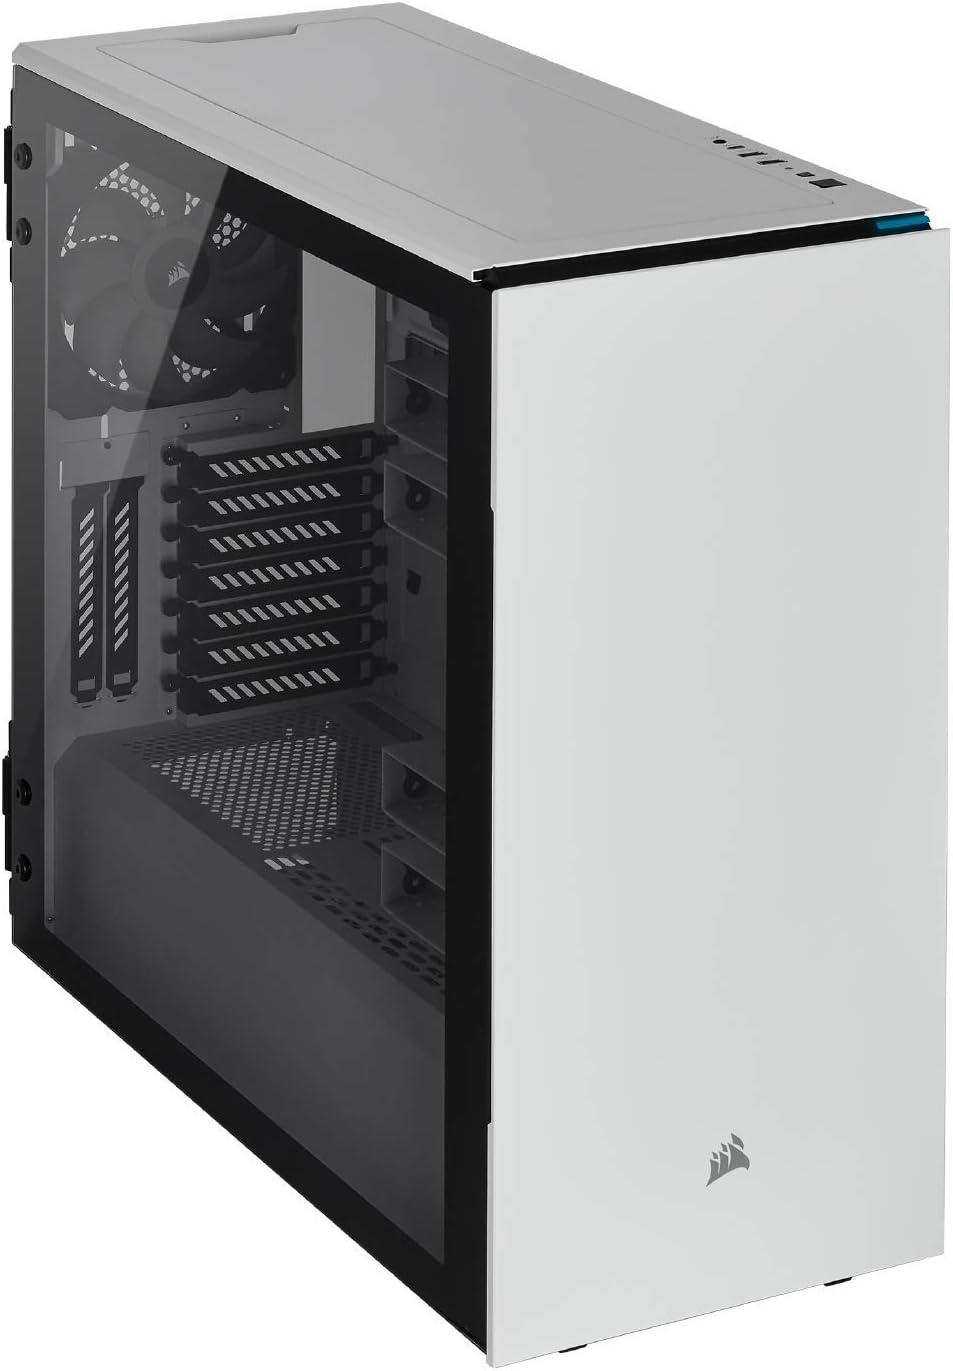 Corsair Carbide Series 678C Low Noise Tempered Glass ATX Case, White